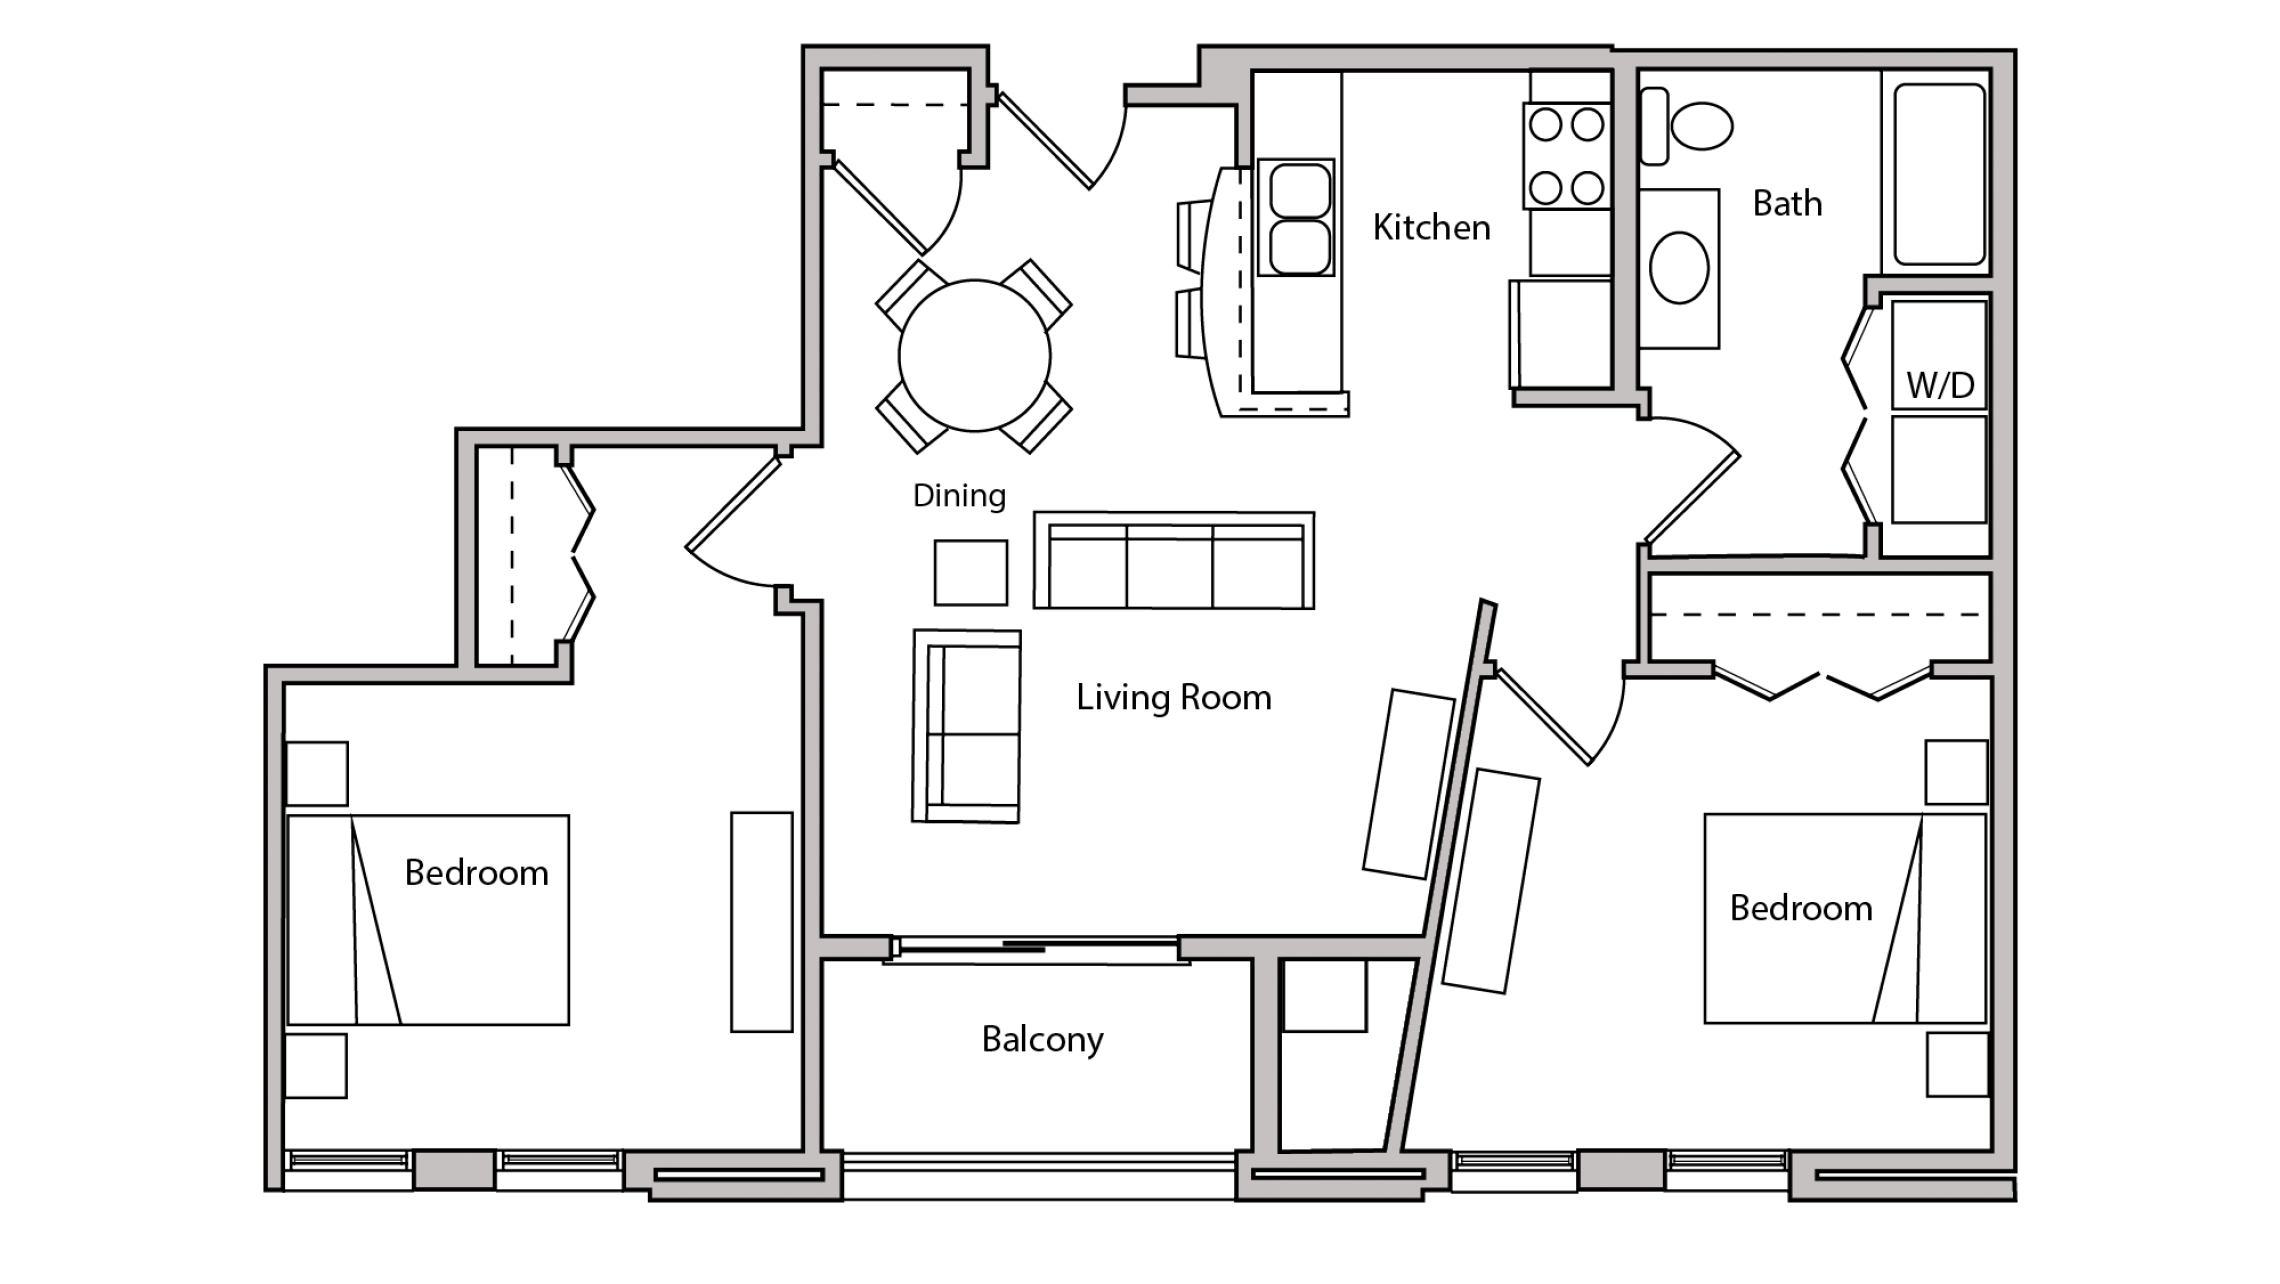 ULI The Depot 2-208 - Two Bedroom, One Bathroom